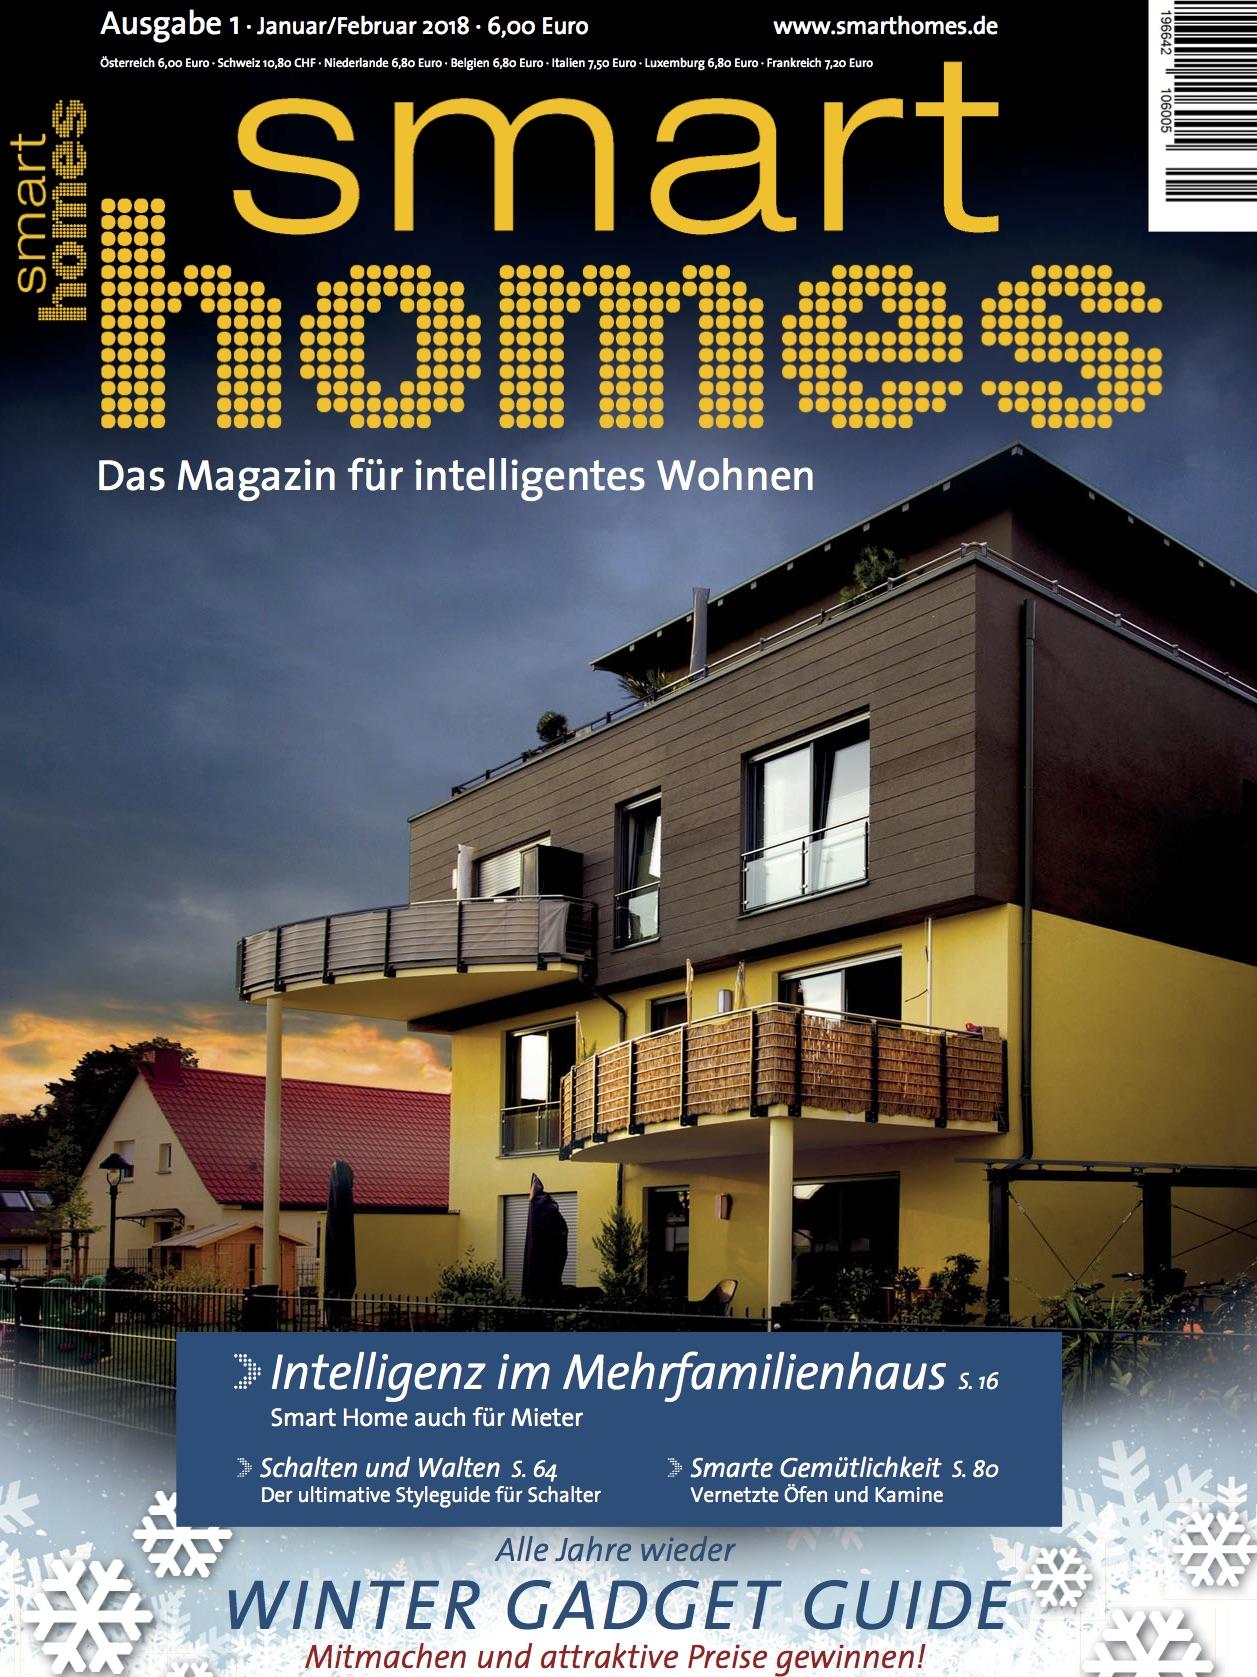 Smart Homes 1.2018